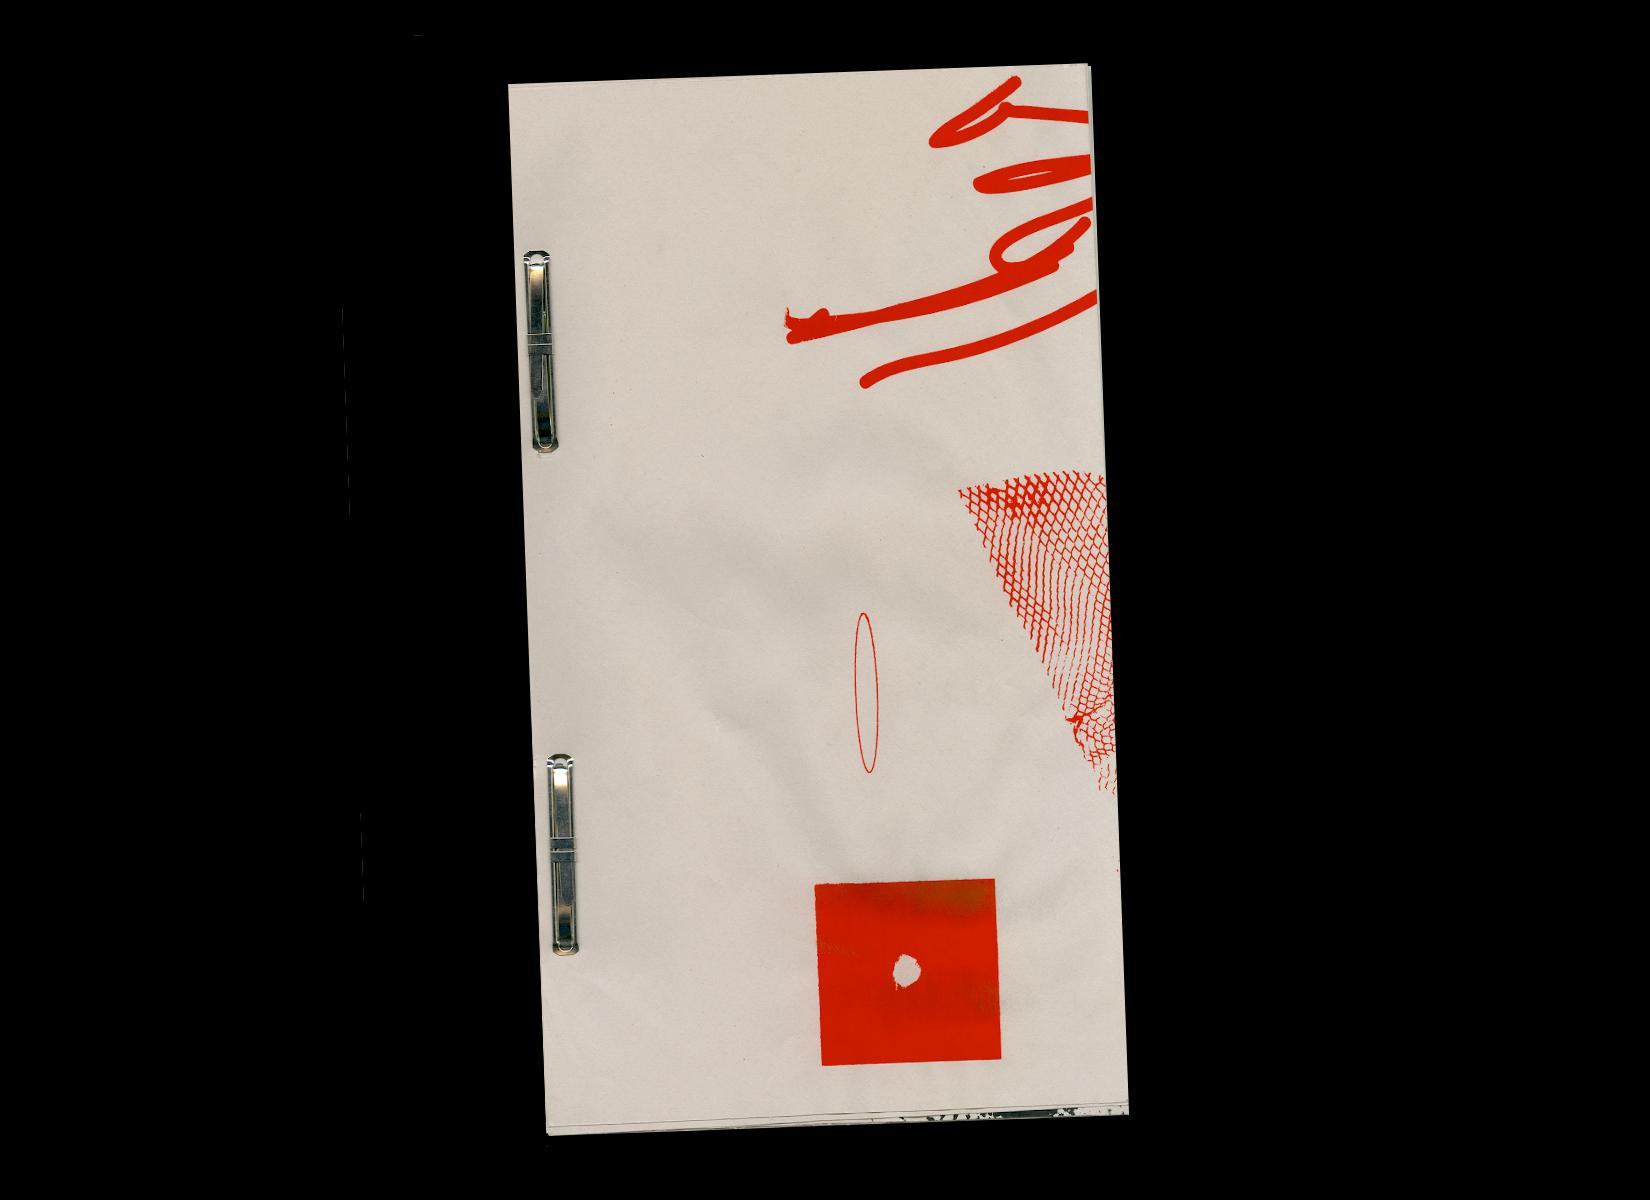 bjames-screenprint_book.png